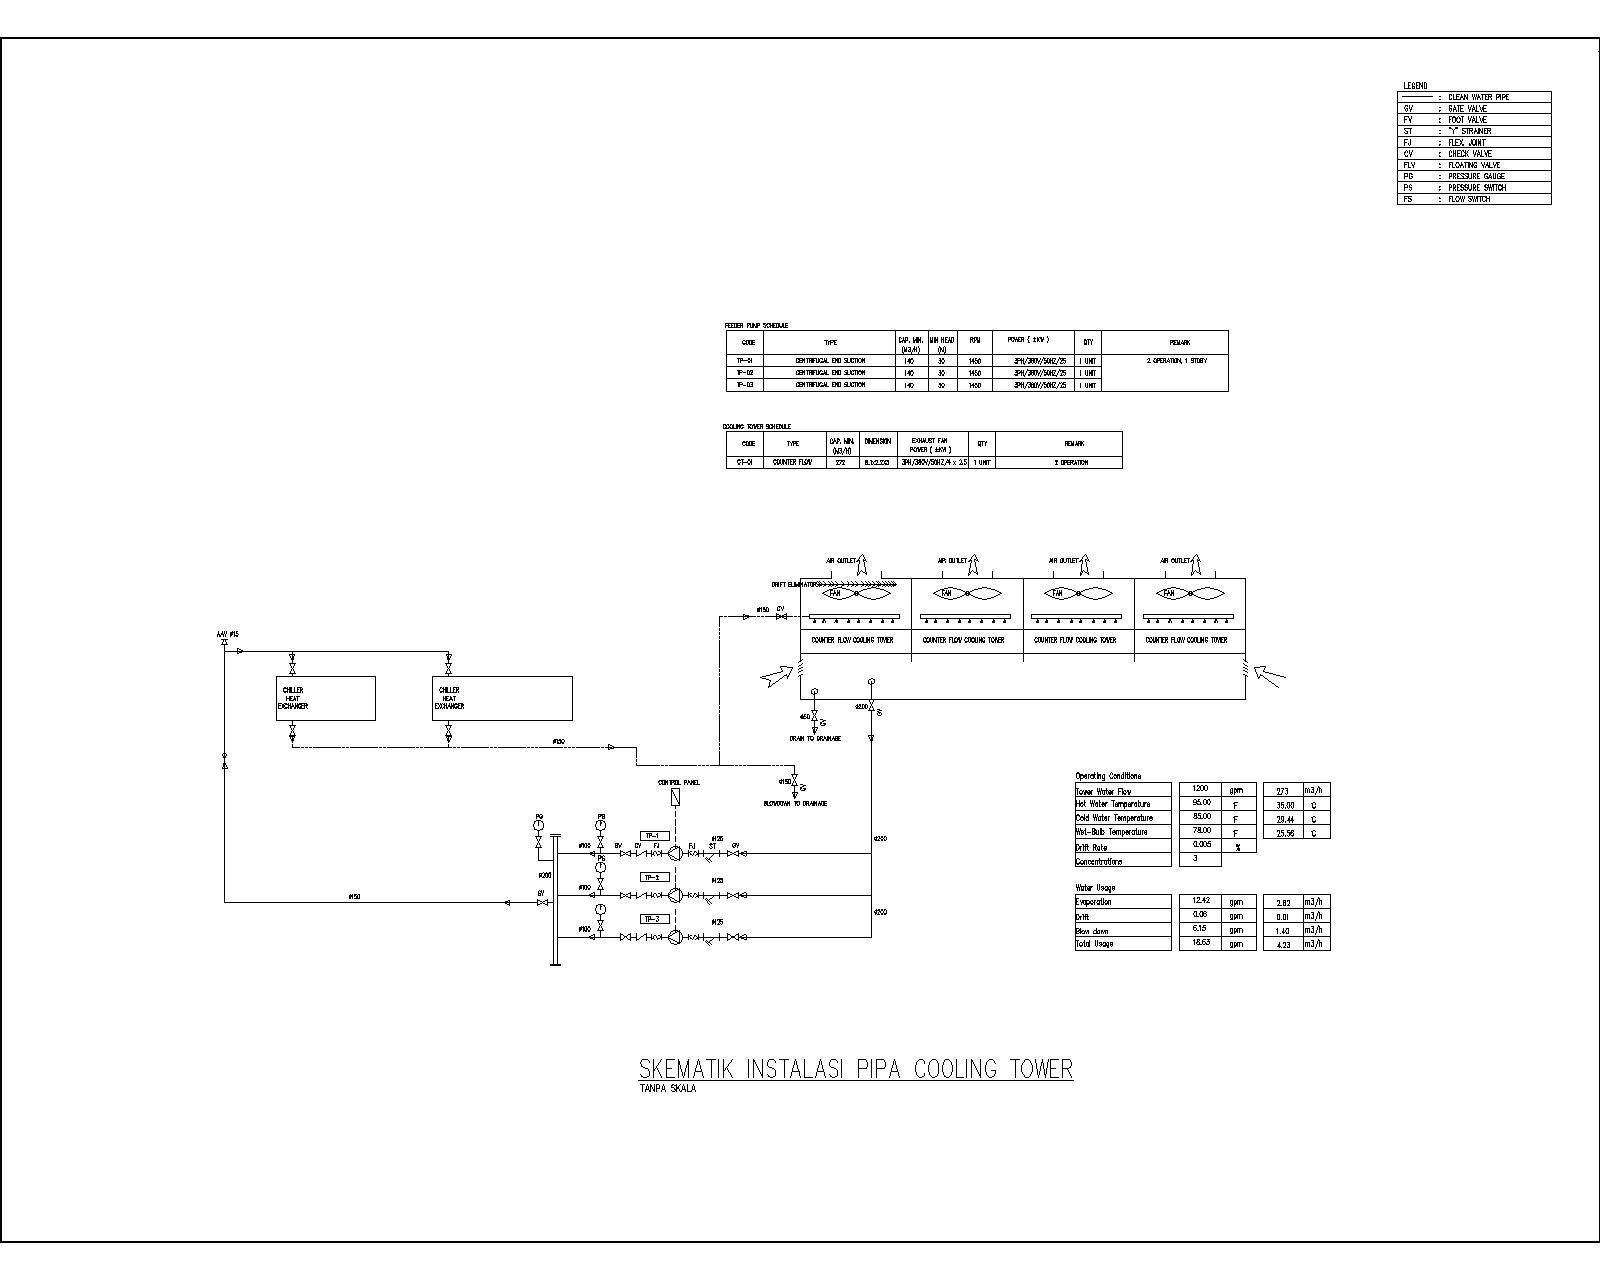 Building Utilities: Water Cooled Chiller Schematic Diagram